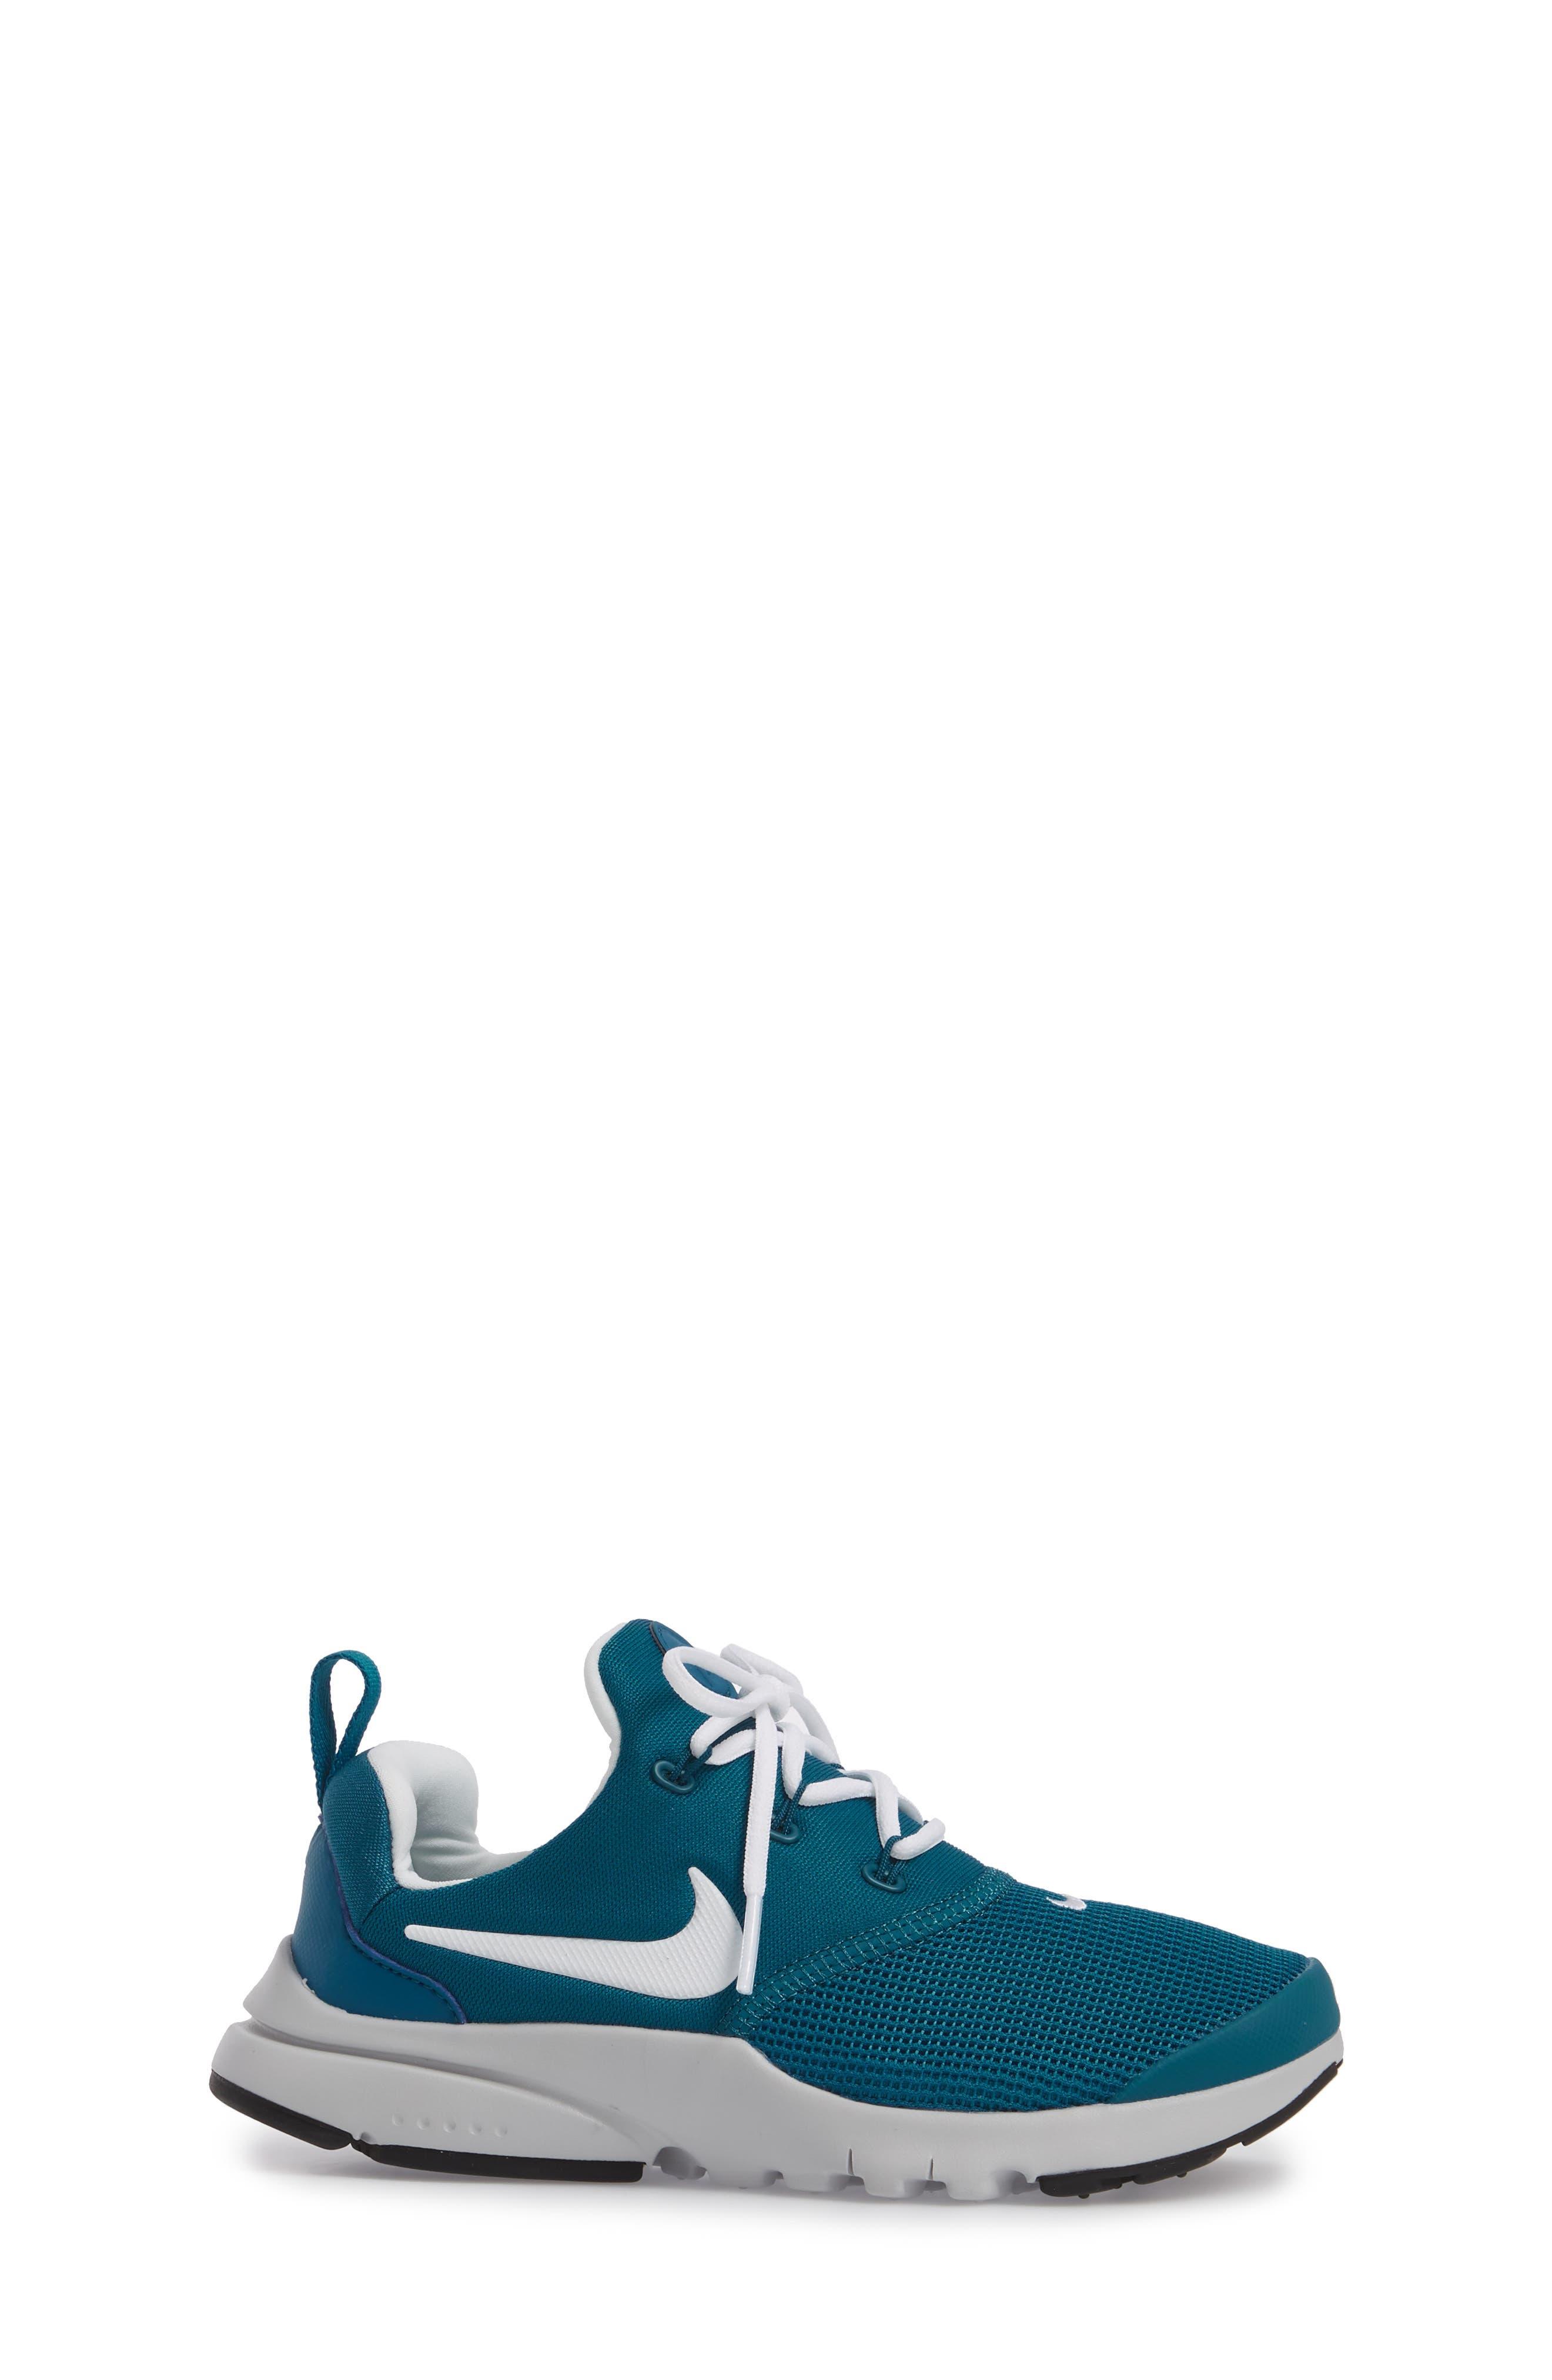 Presto Fly Sneaker,                             Alternate thumbnail 3, color,                             Green Abyss/ Platinum/ Black